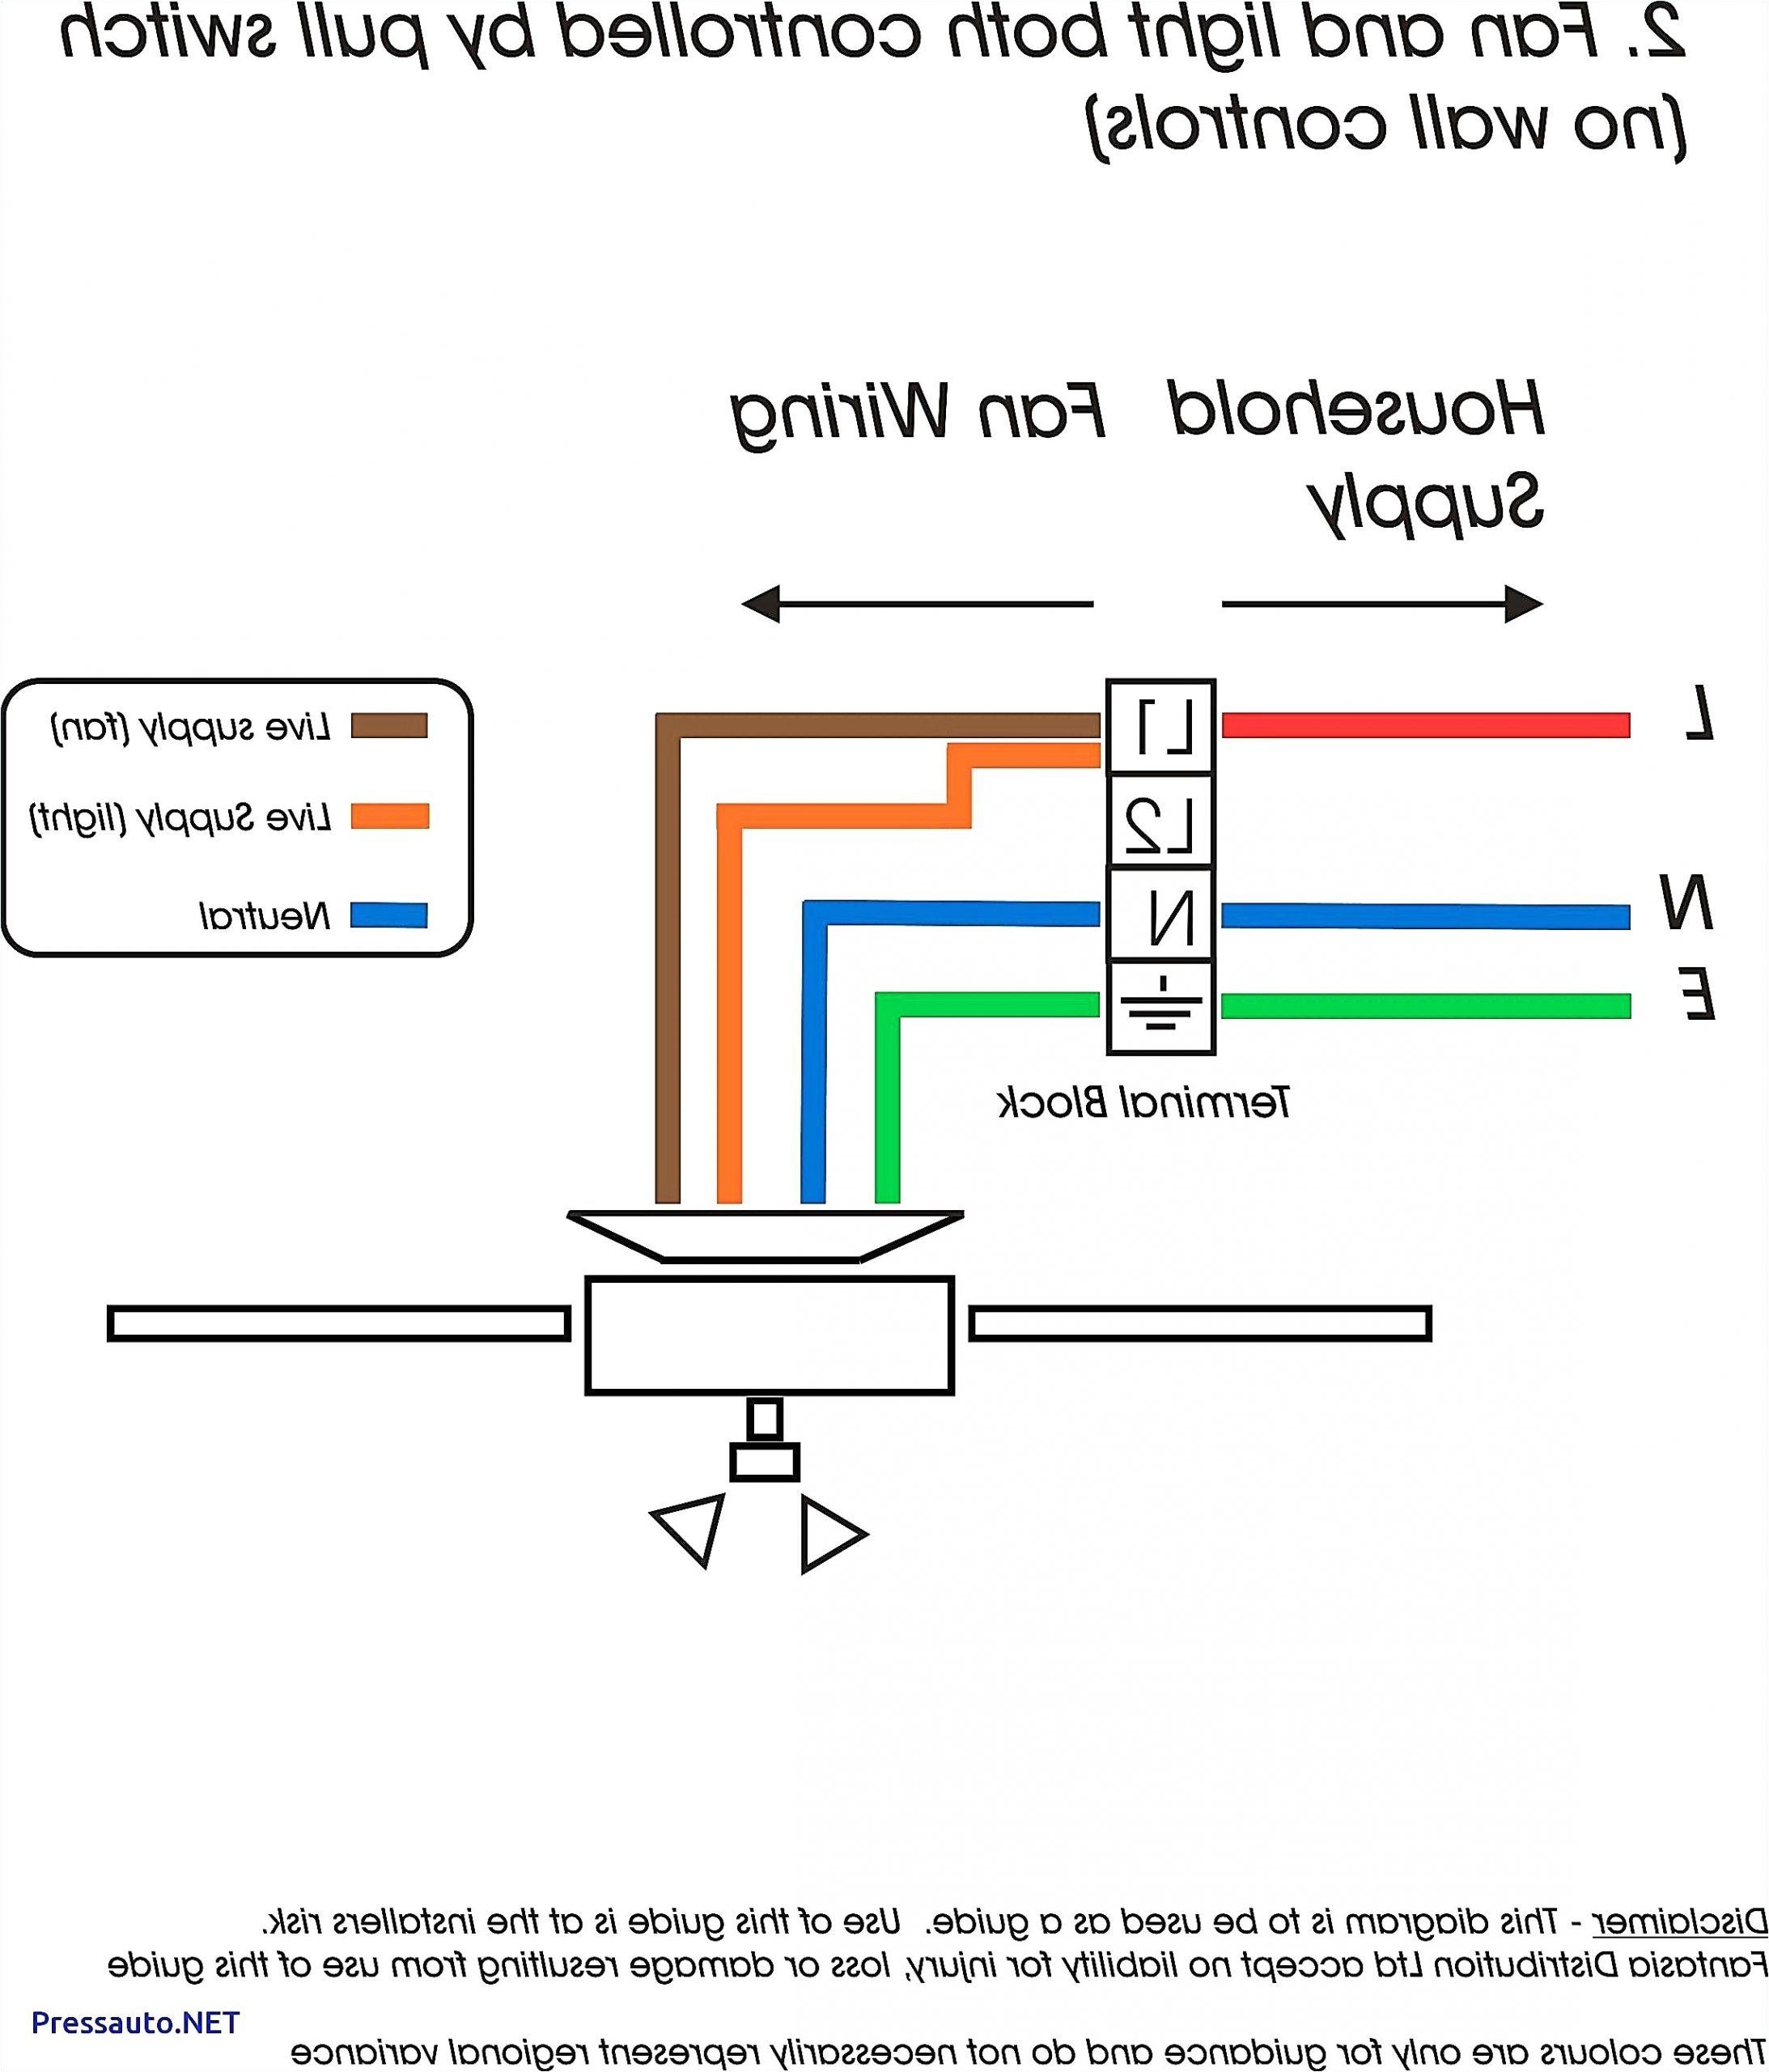 parts diagram for club car ezgo ignition switch wiring diagram save wiring diagram for club car of parts diagram for club car jpg